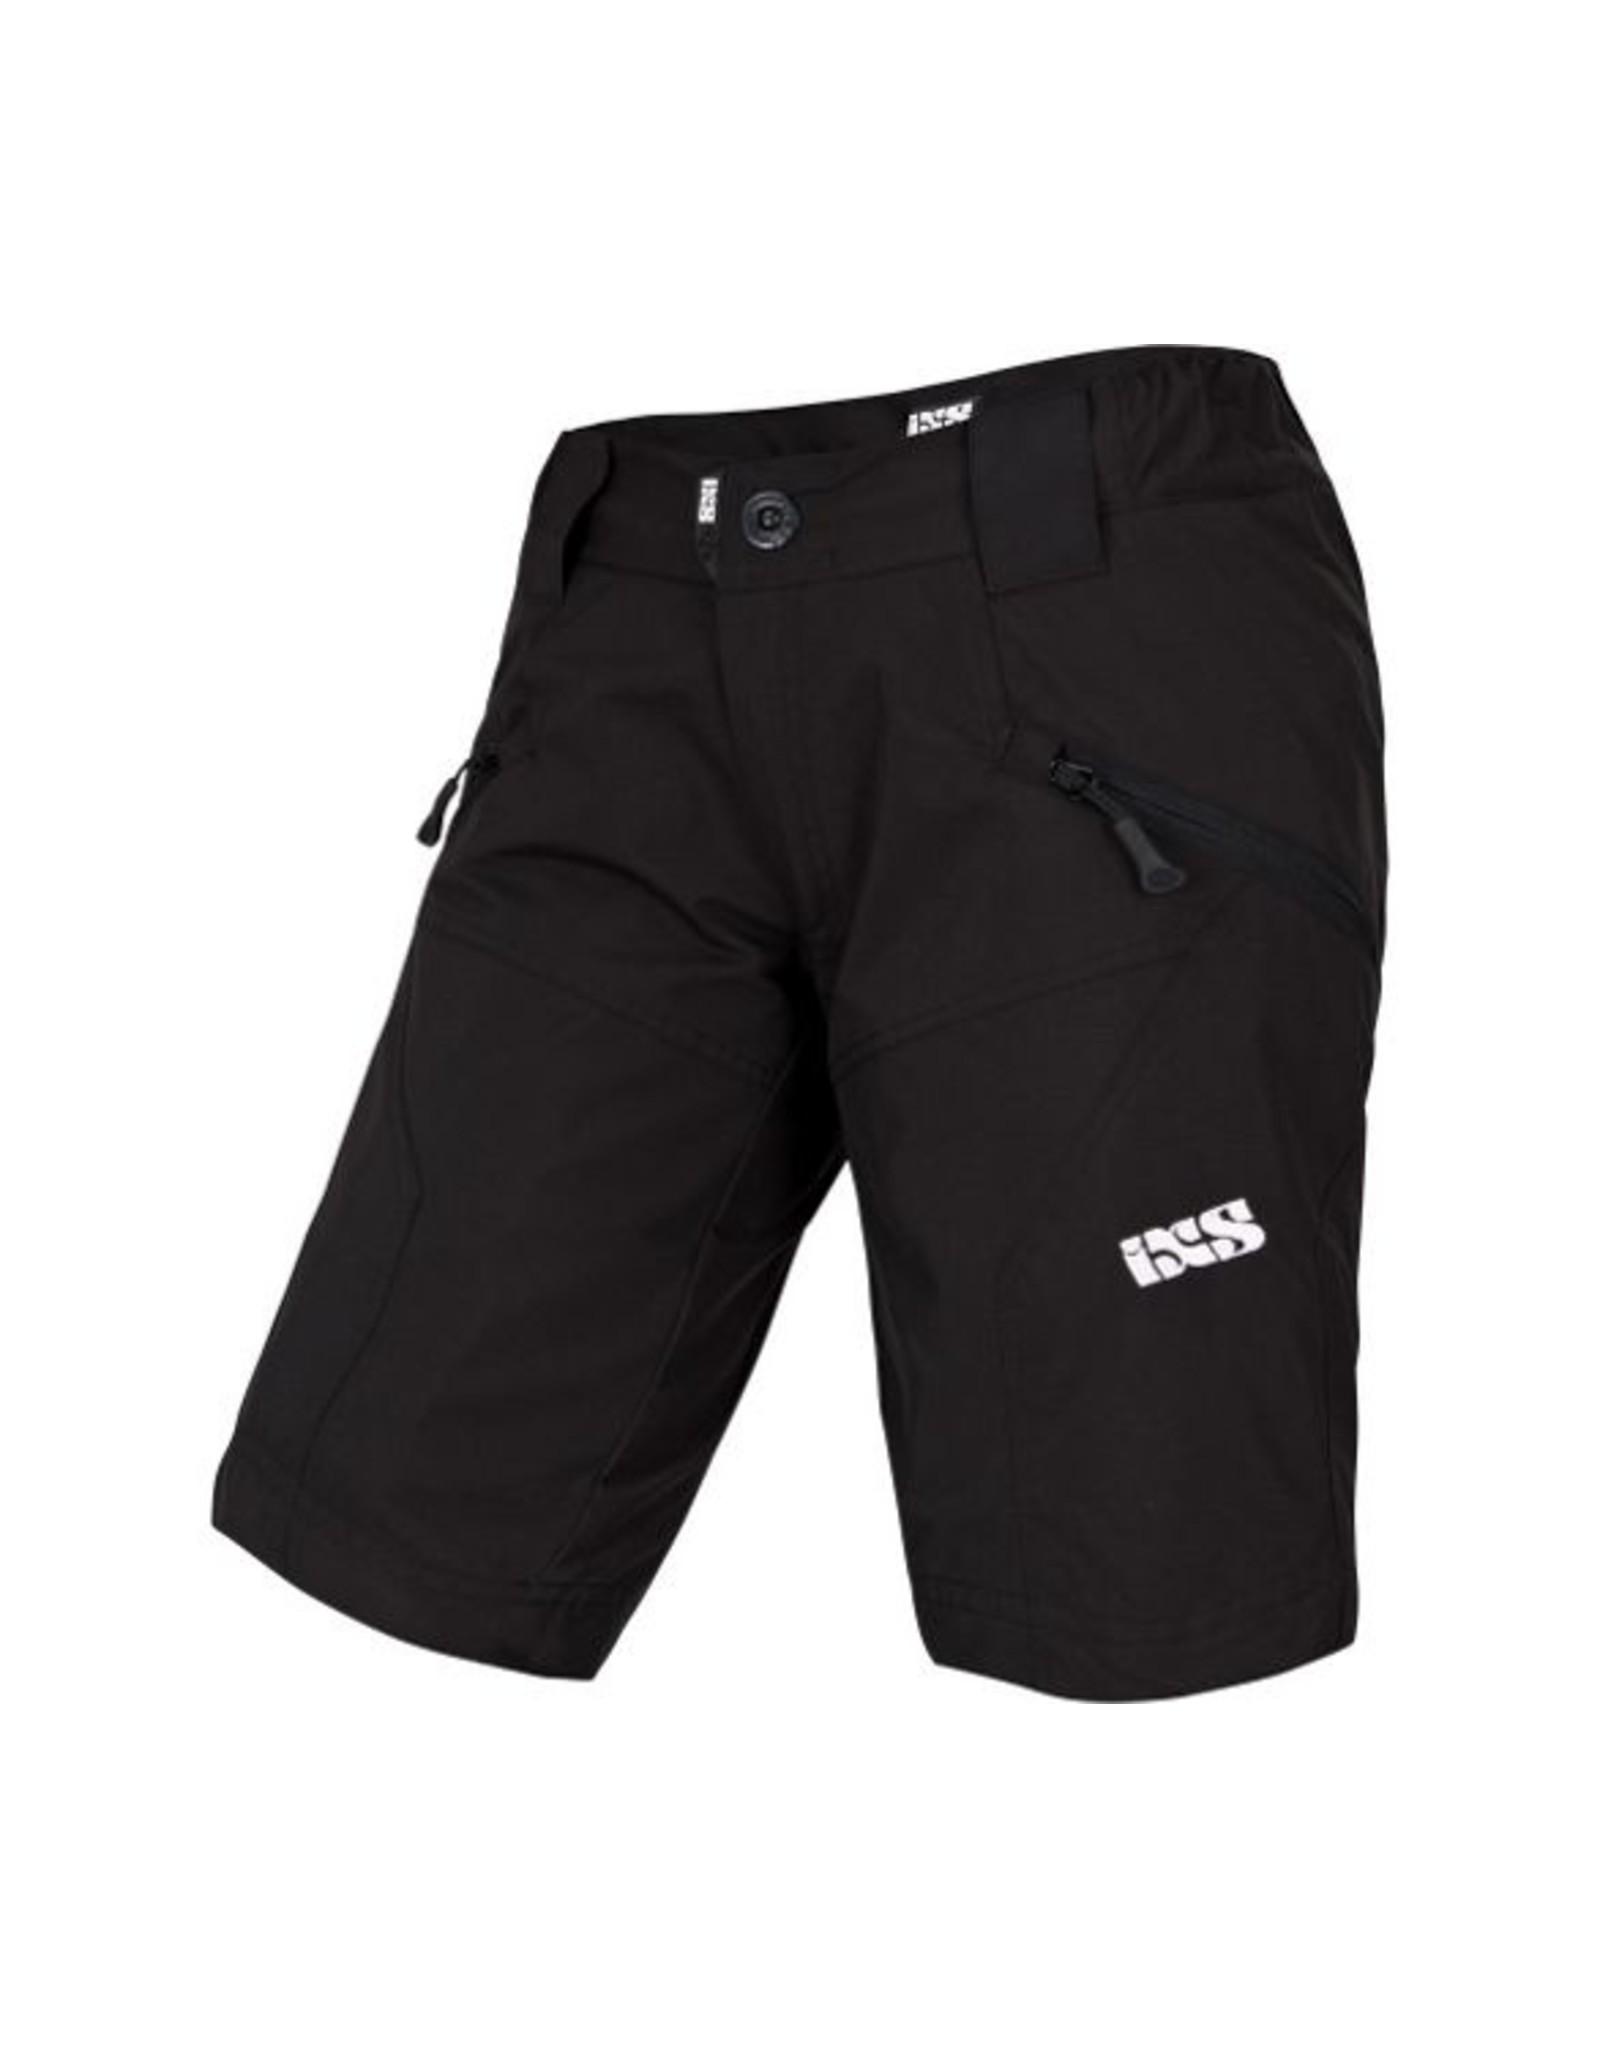 IXS IXS Youth Short S